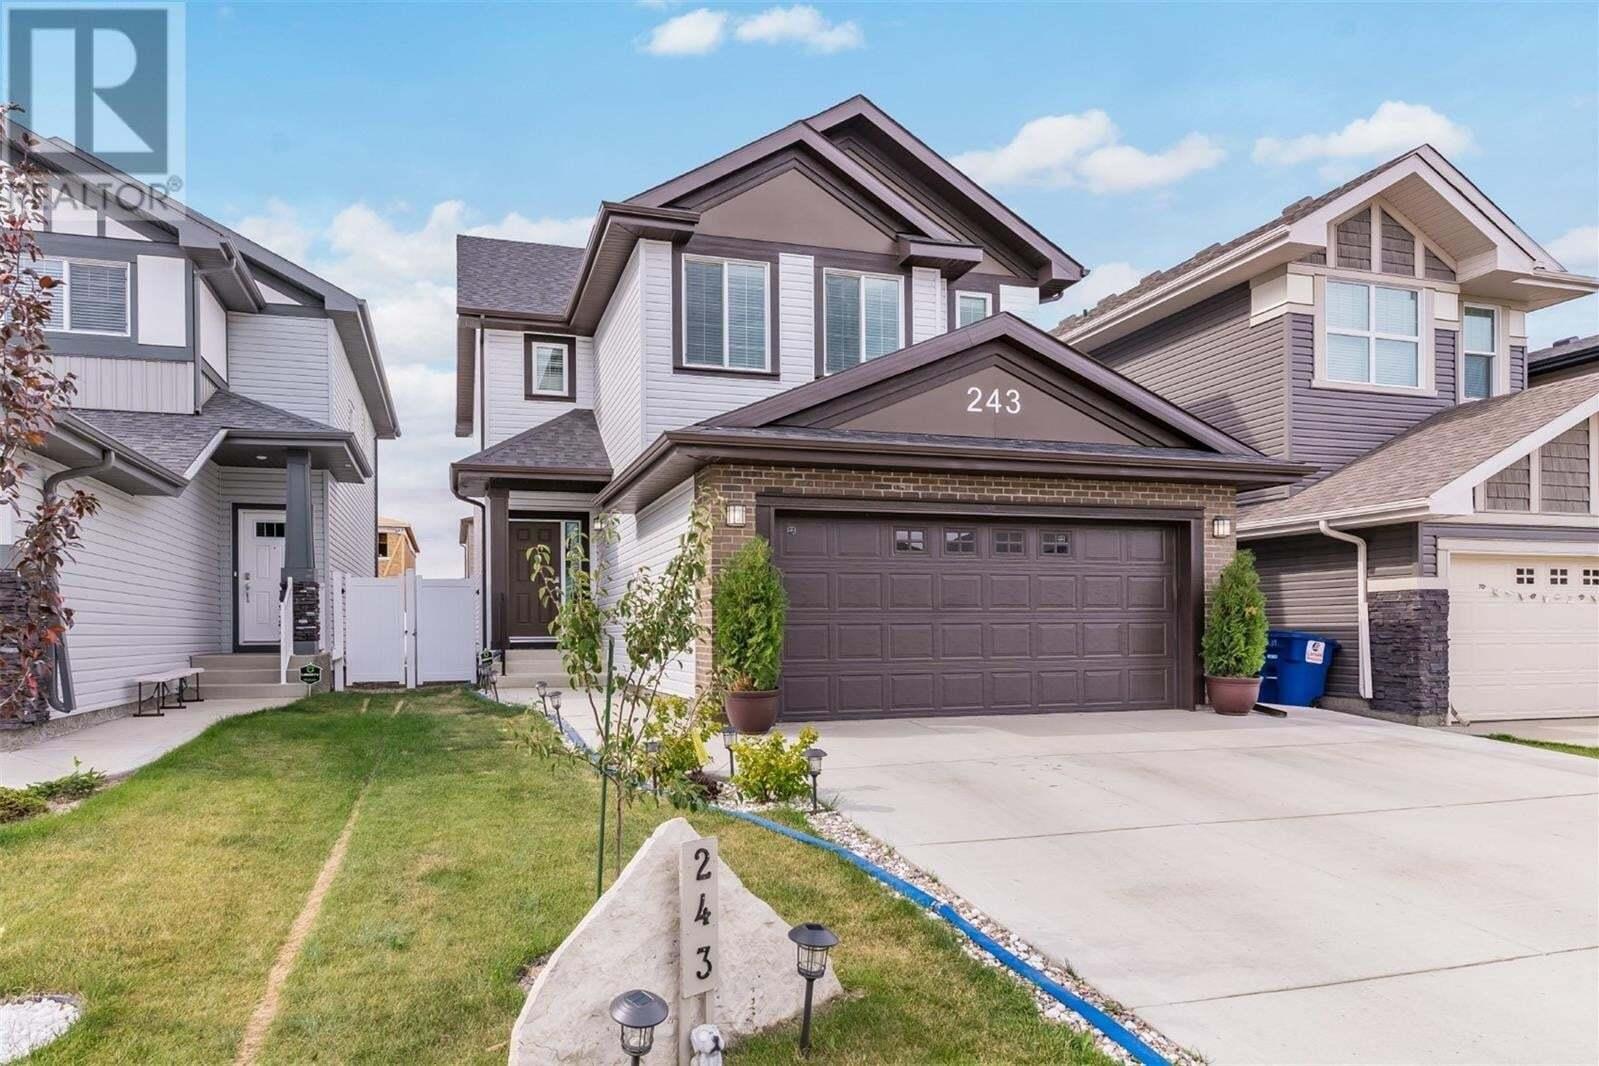 House for sale at 243 Dagnone Ln Saskatoon Saskatchewan - MLS: SK821592